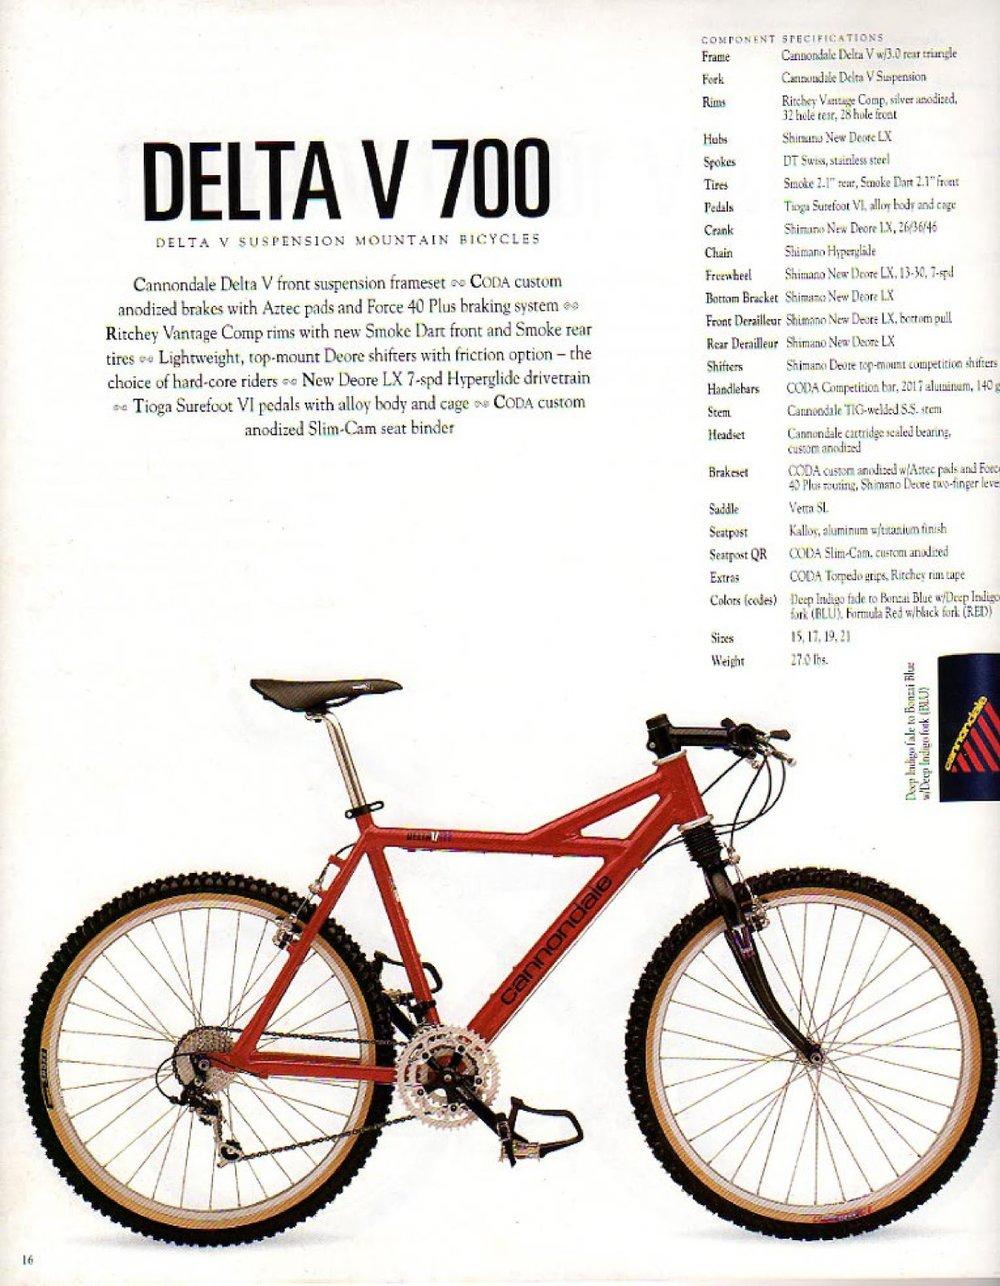 CATALOGUE VELOS CANNONDALE 1993 (16).jpg